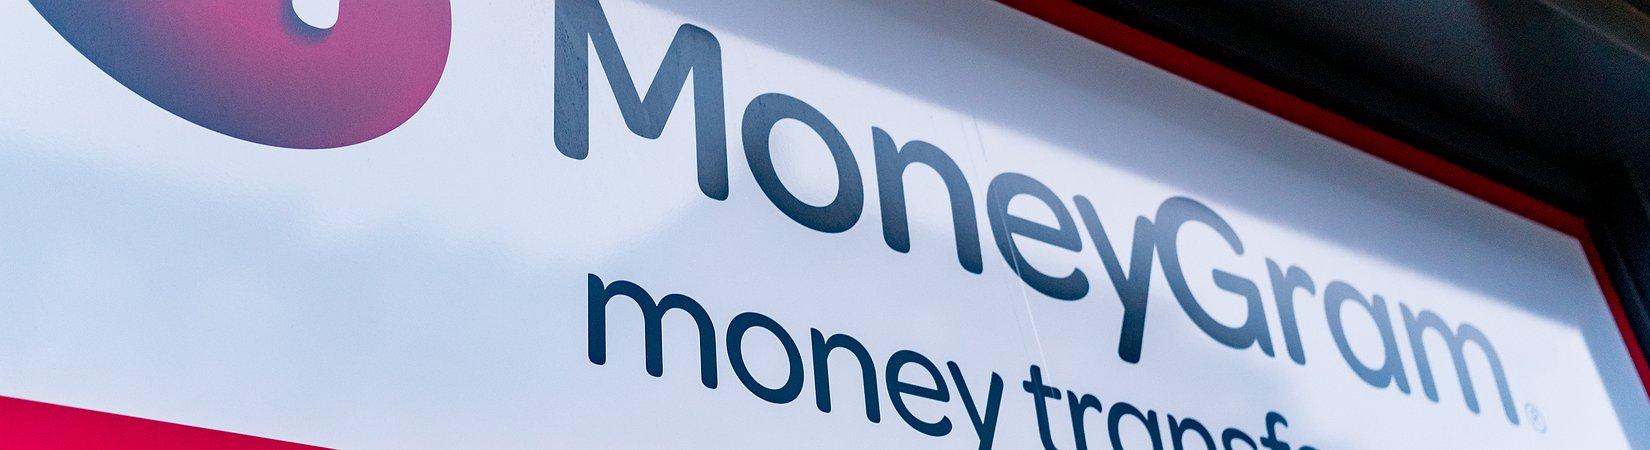 Сенаторы США: Сделка MoneyGram и Alibaba — угроза нацбезопасности